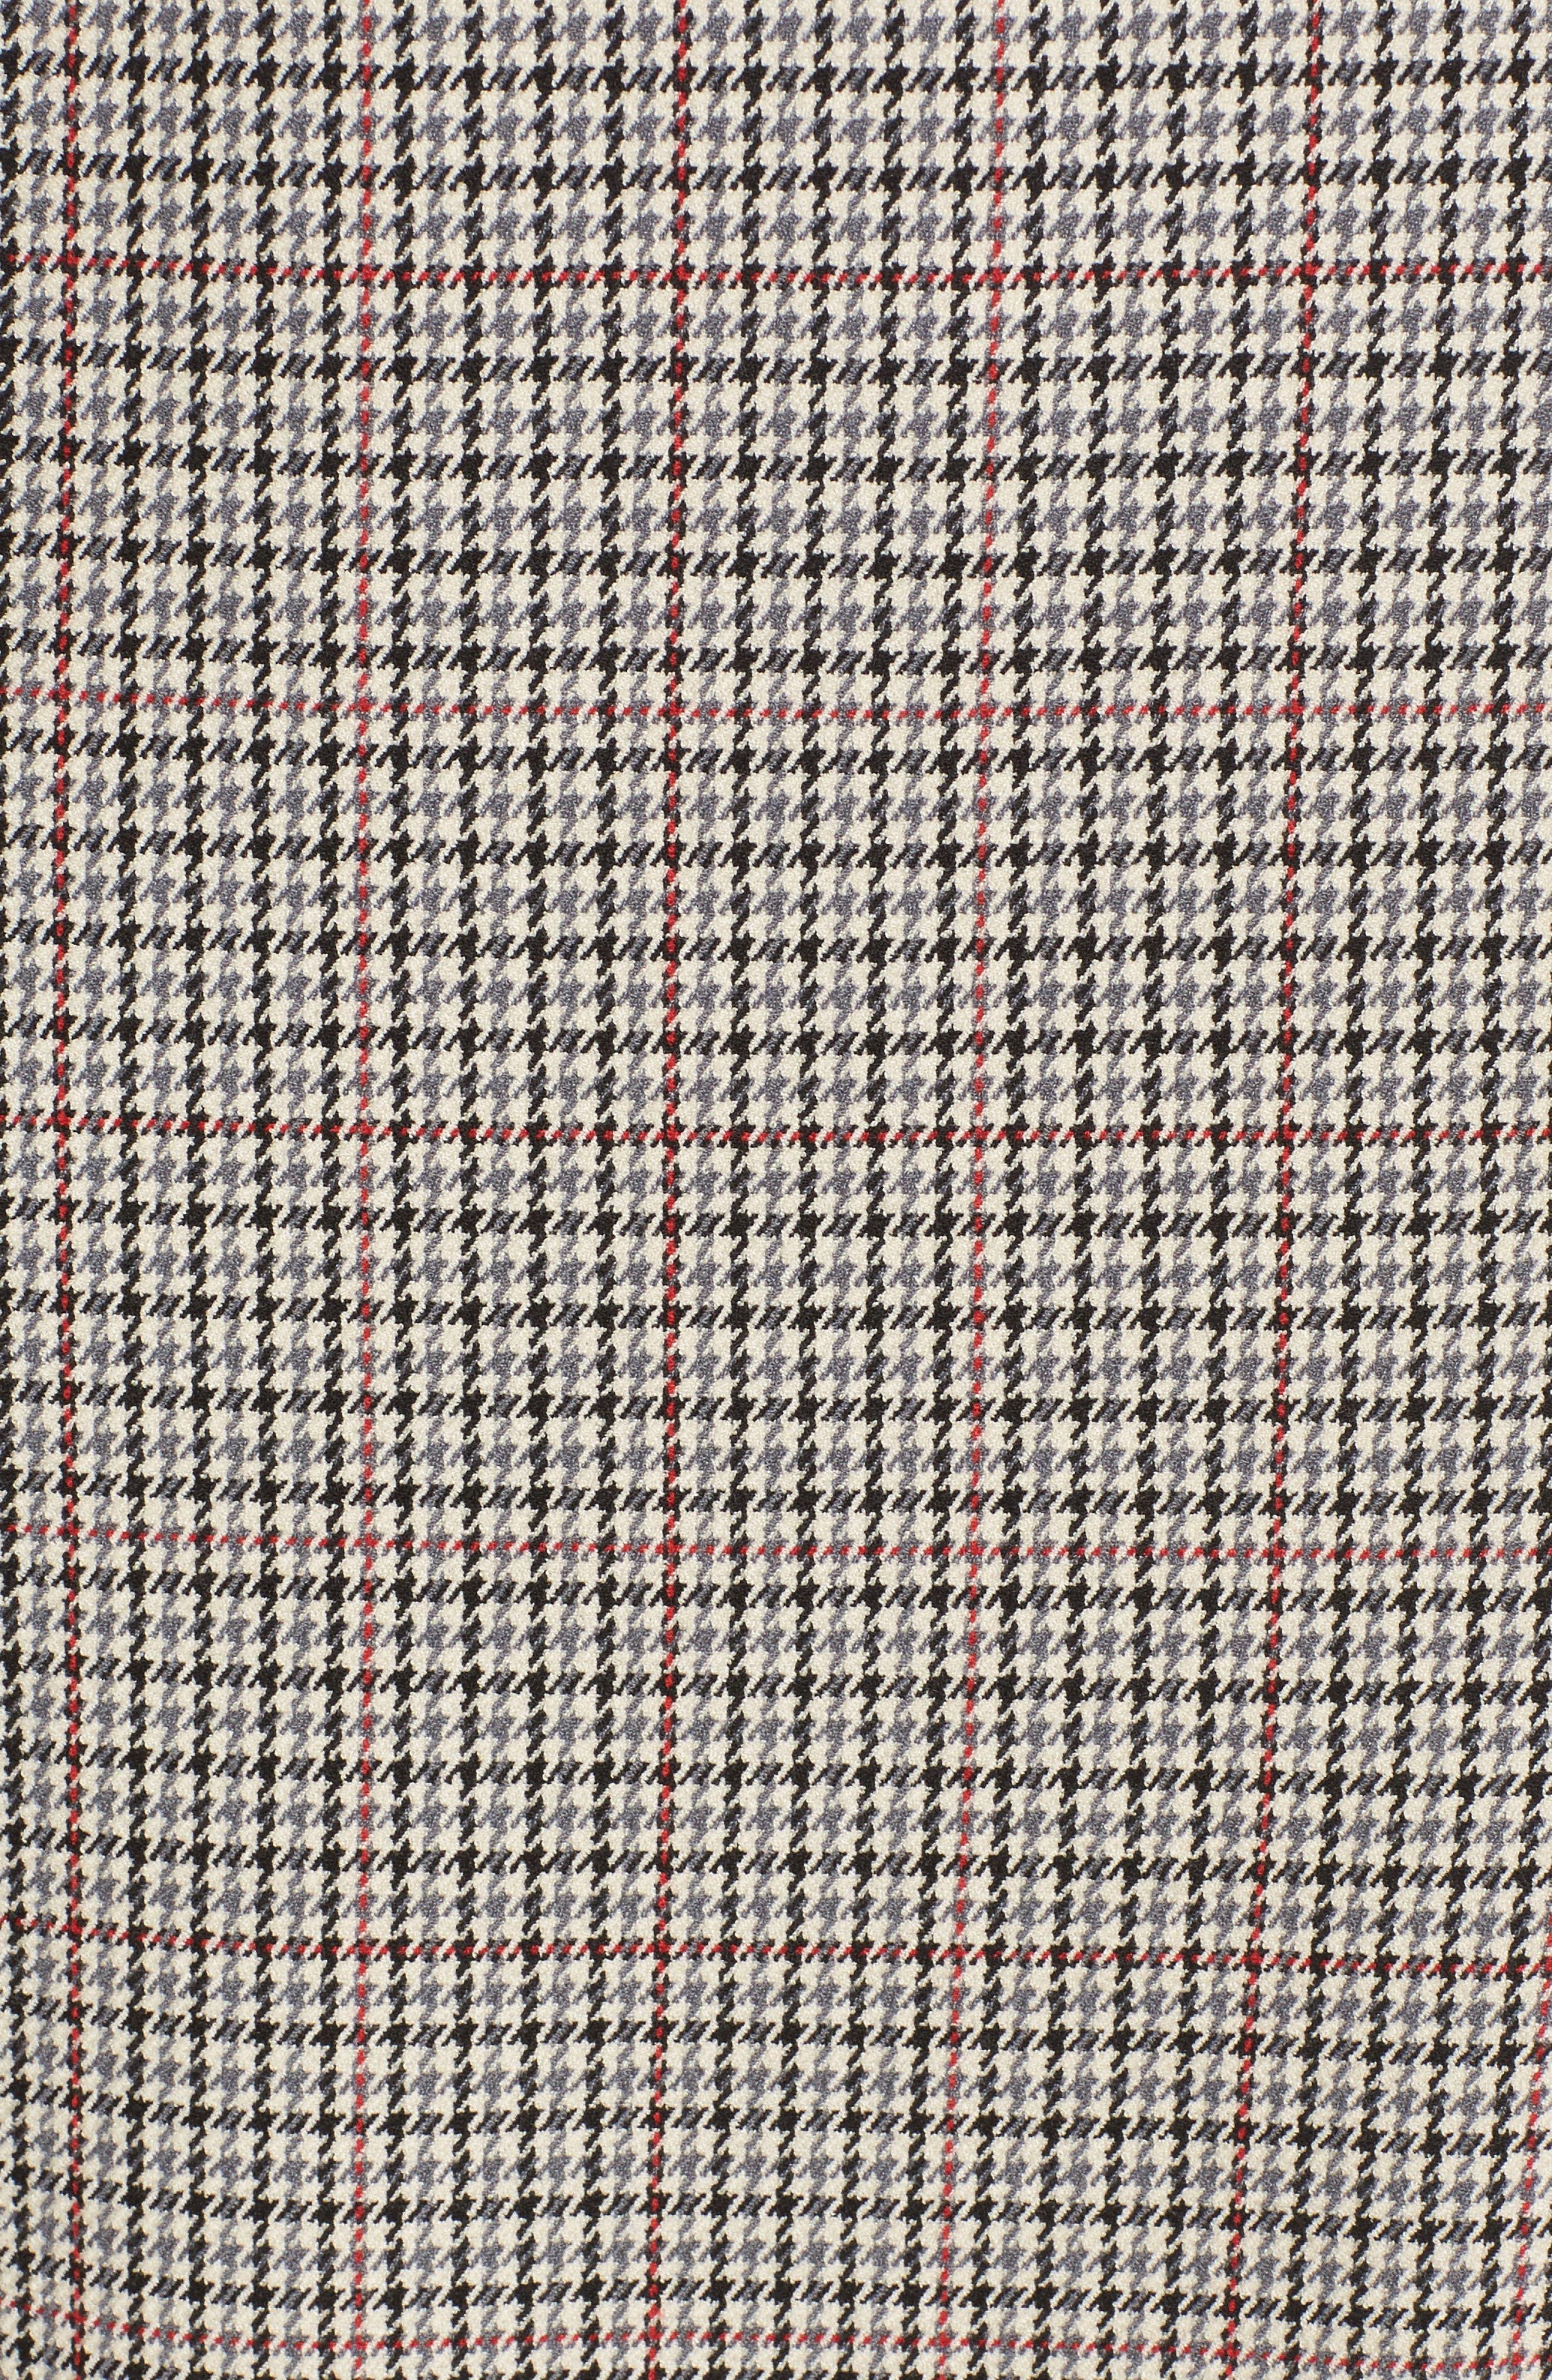 Houndstooth Sheath Dress,                             Alternate thumbnail 5, color,                             270